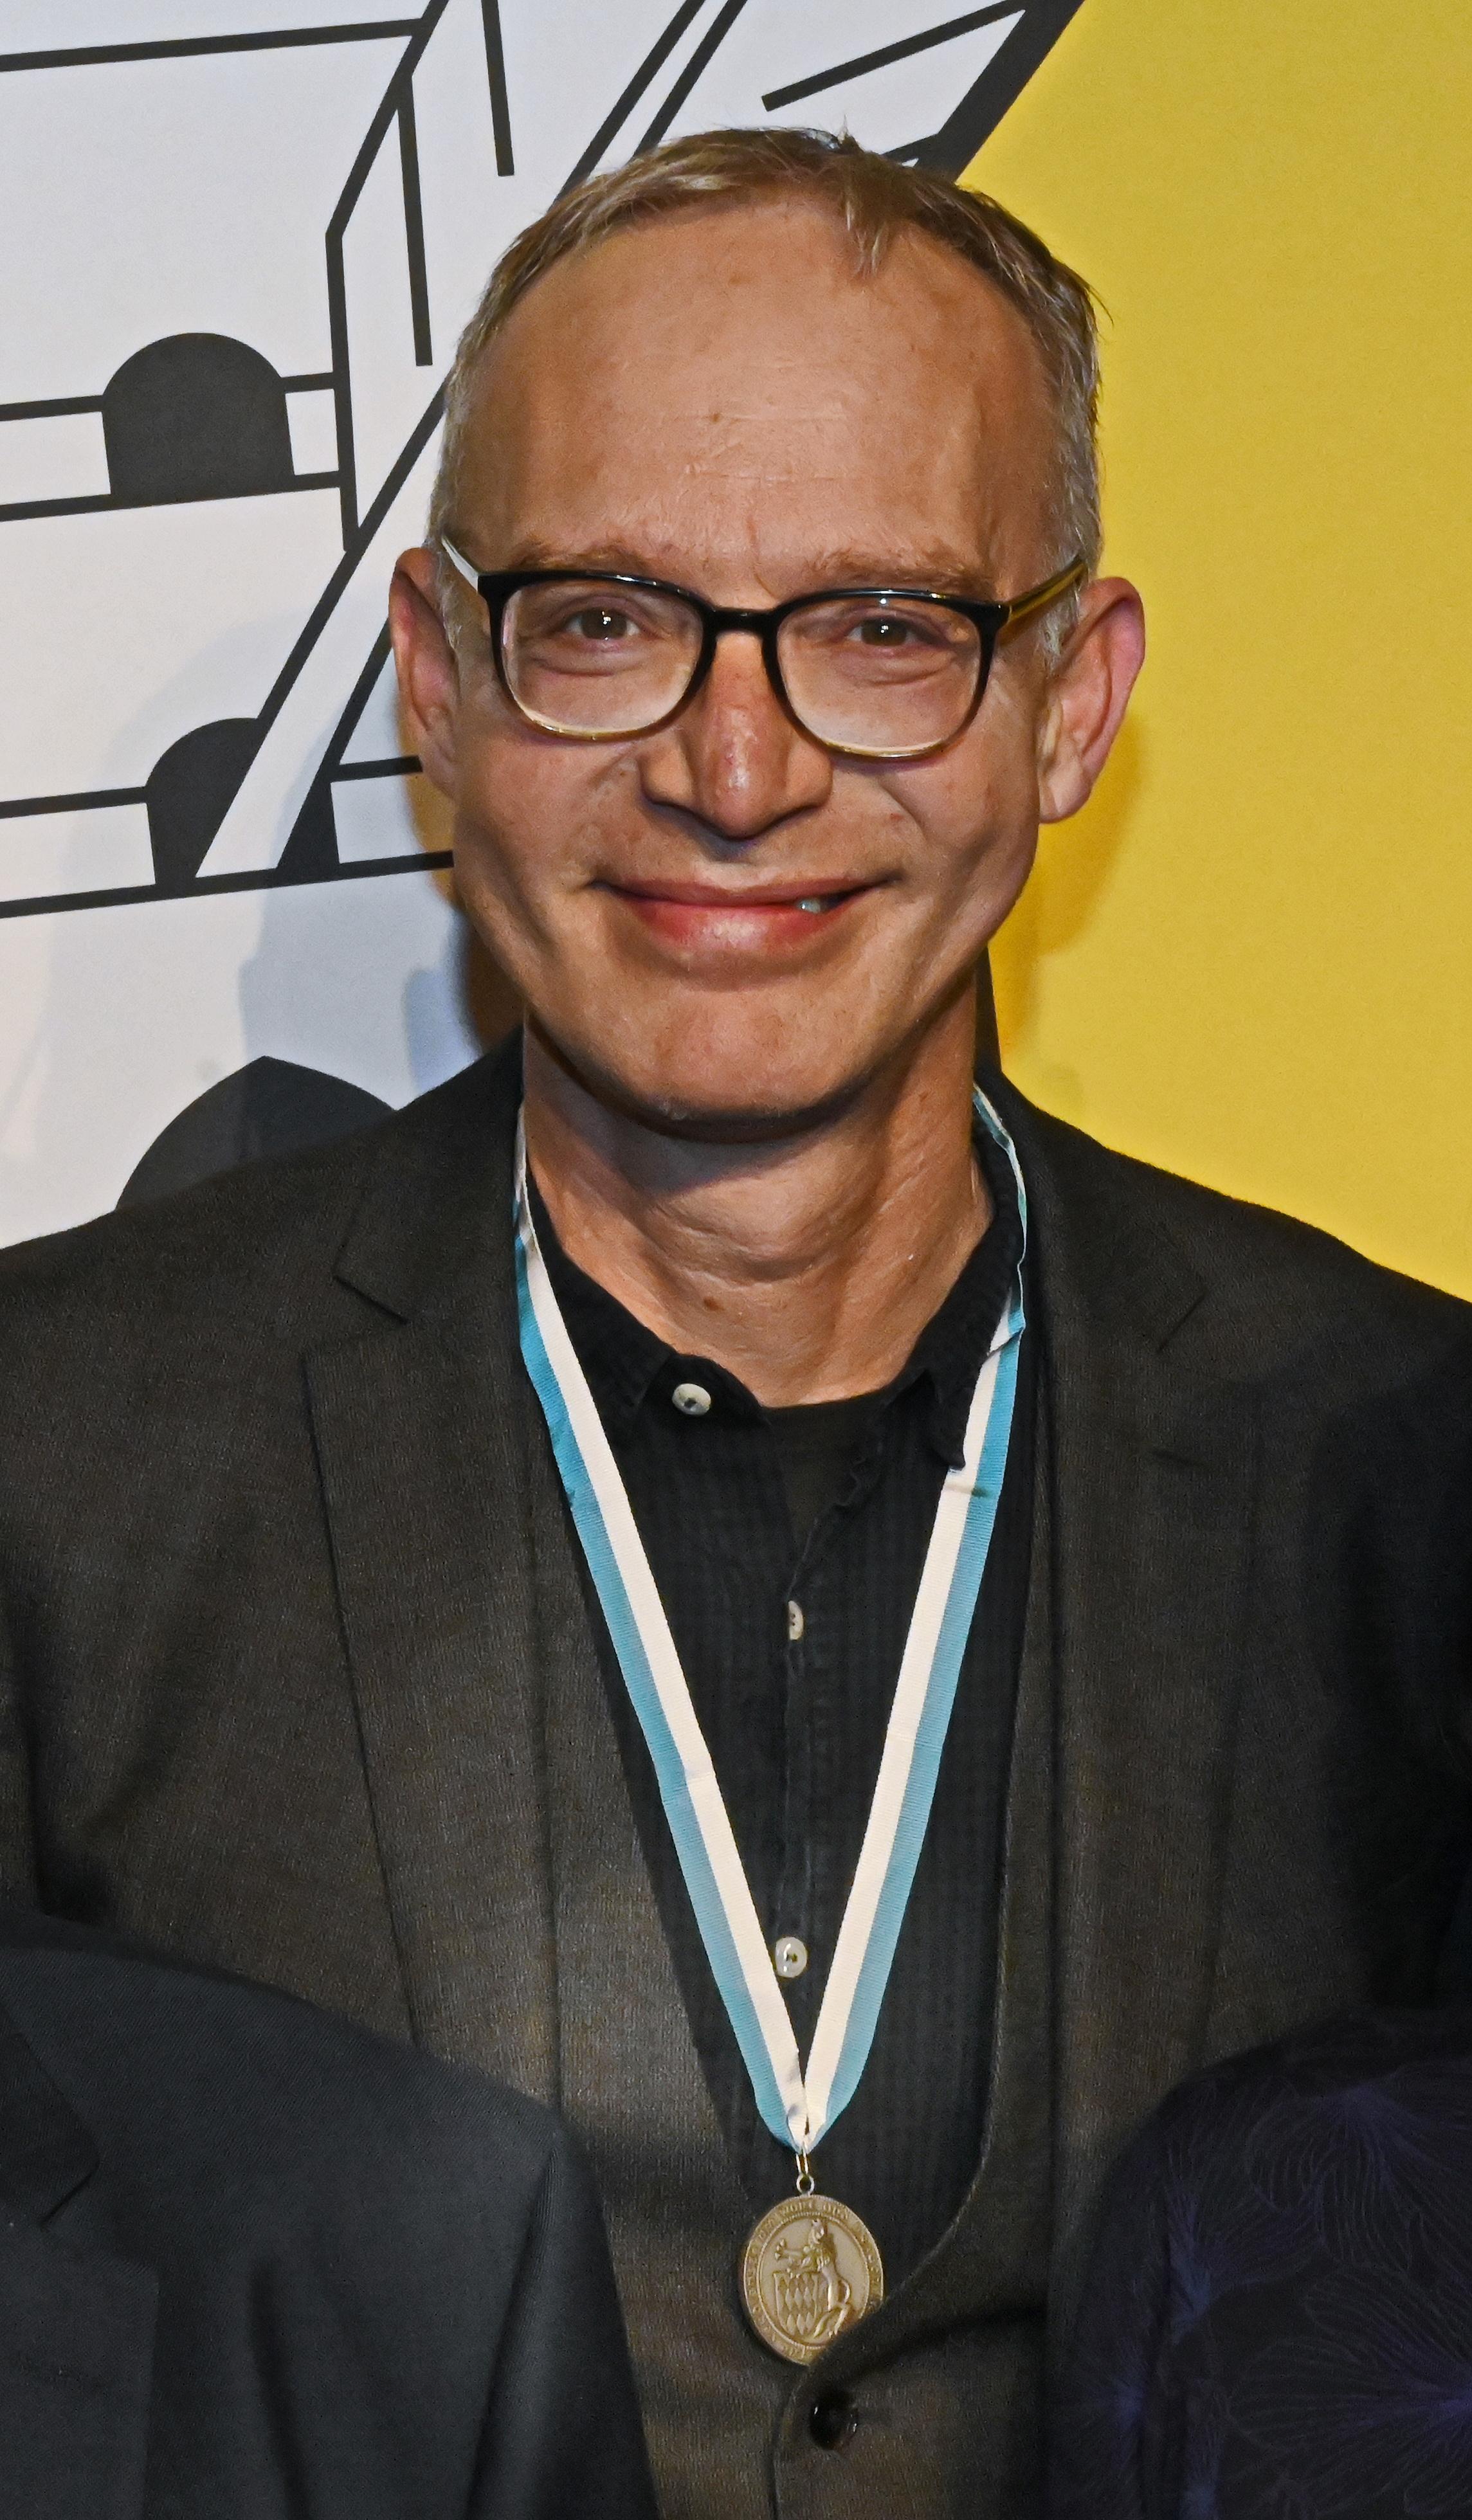 Süß verheiratet christoph Christoph Süß